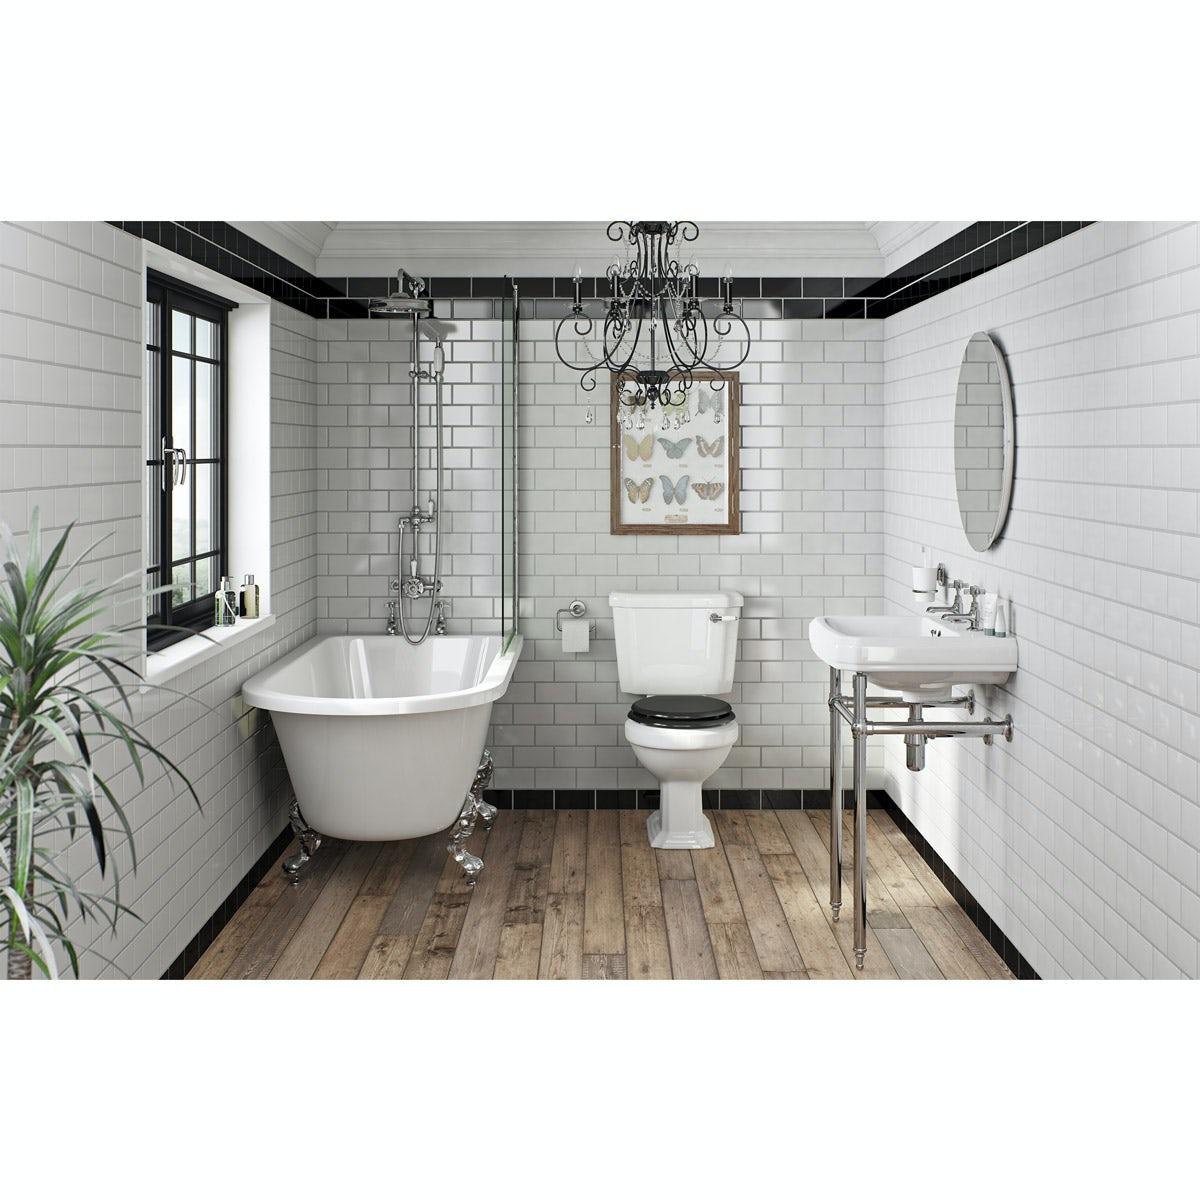 The Bath Co. Dulwich black bathroom suite with freestanding shower bath